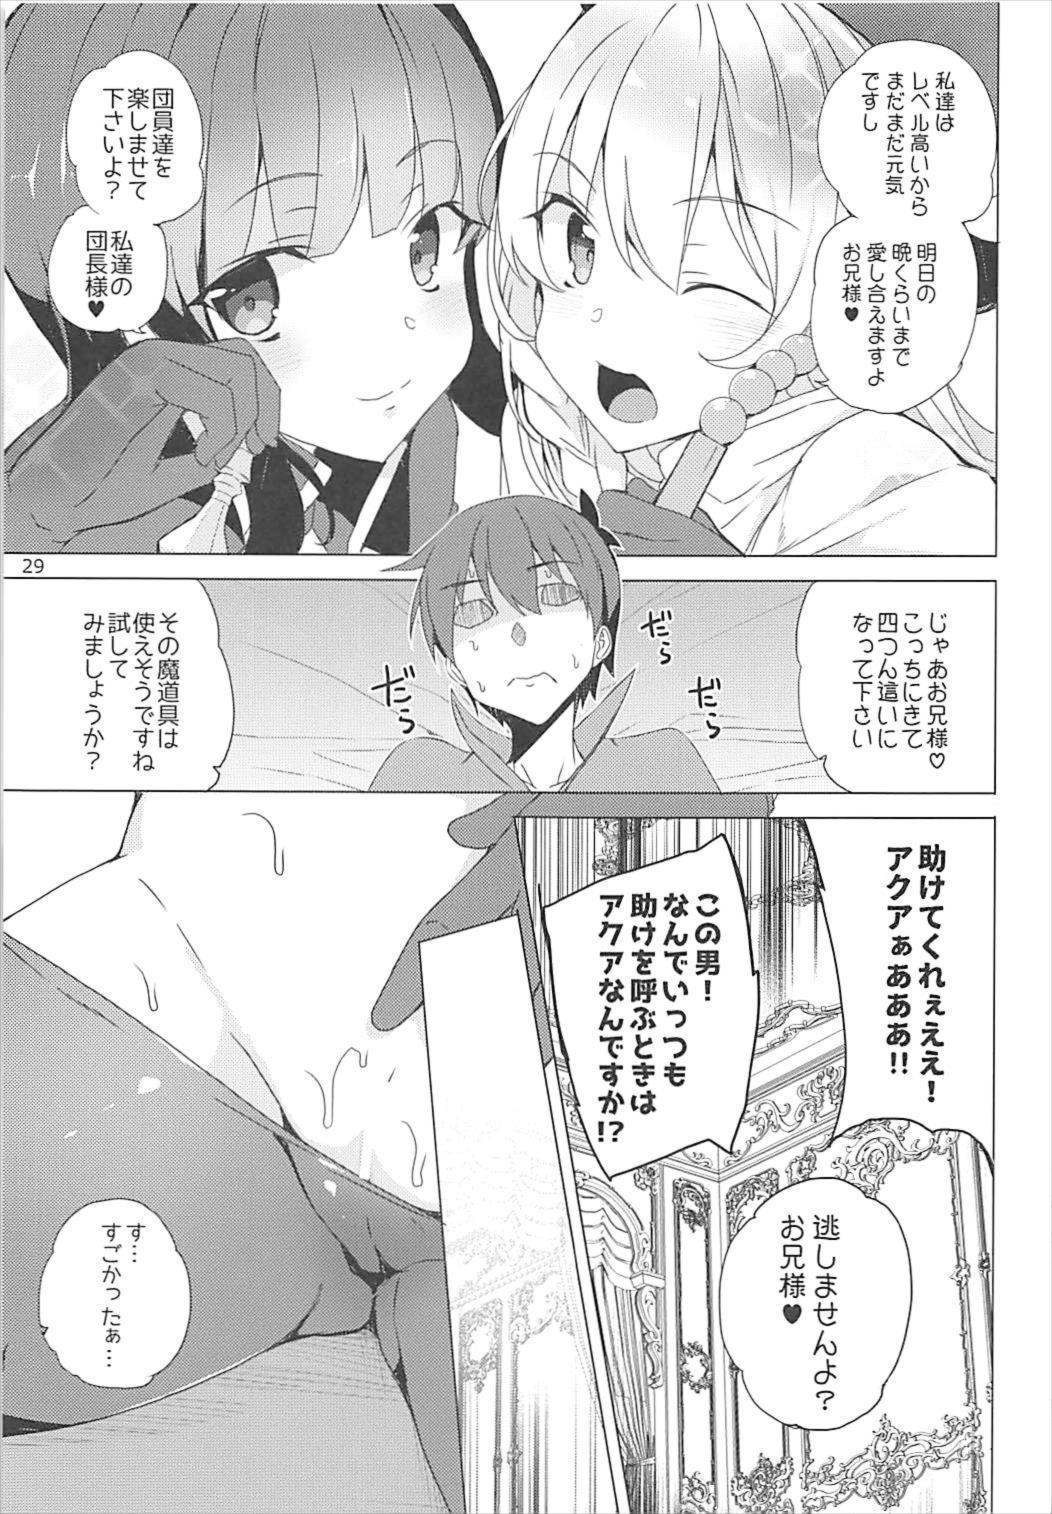 Sore Ike! Megumin Touzokudan 27